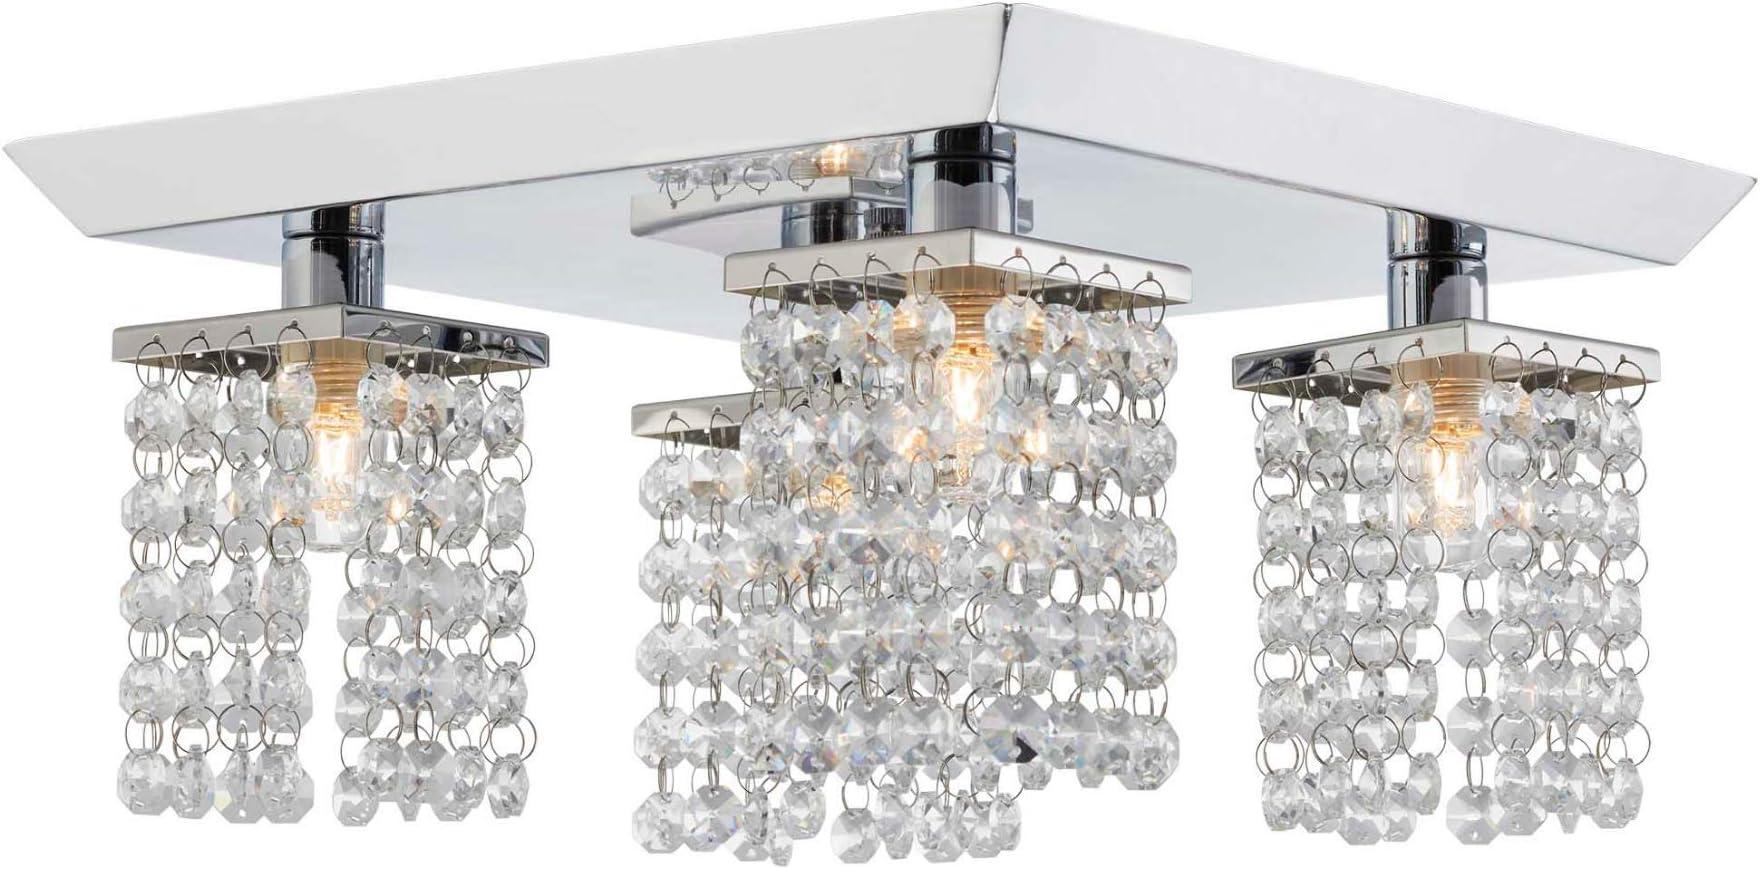 NOMA LED Adjustable Crystal Finish Semi-Flush Ceiling Light Fixture with 4 Lights for Track Lighting